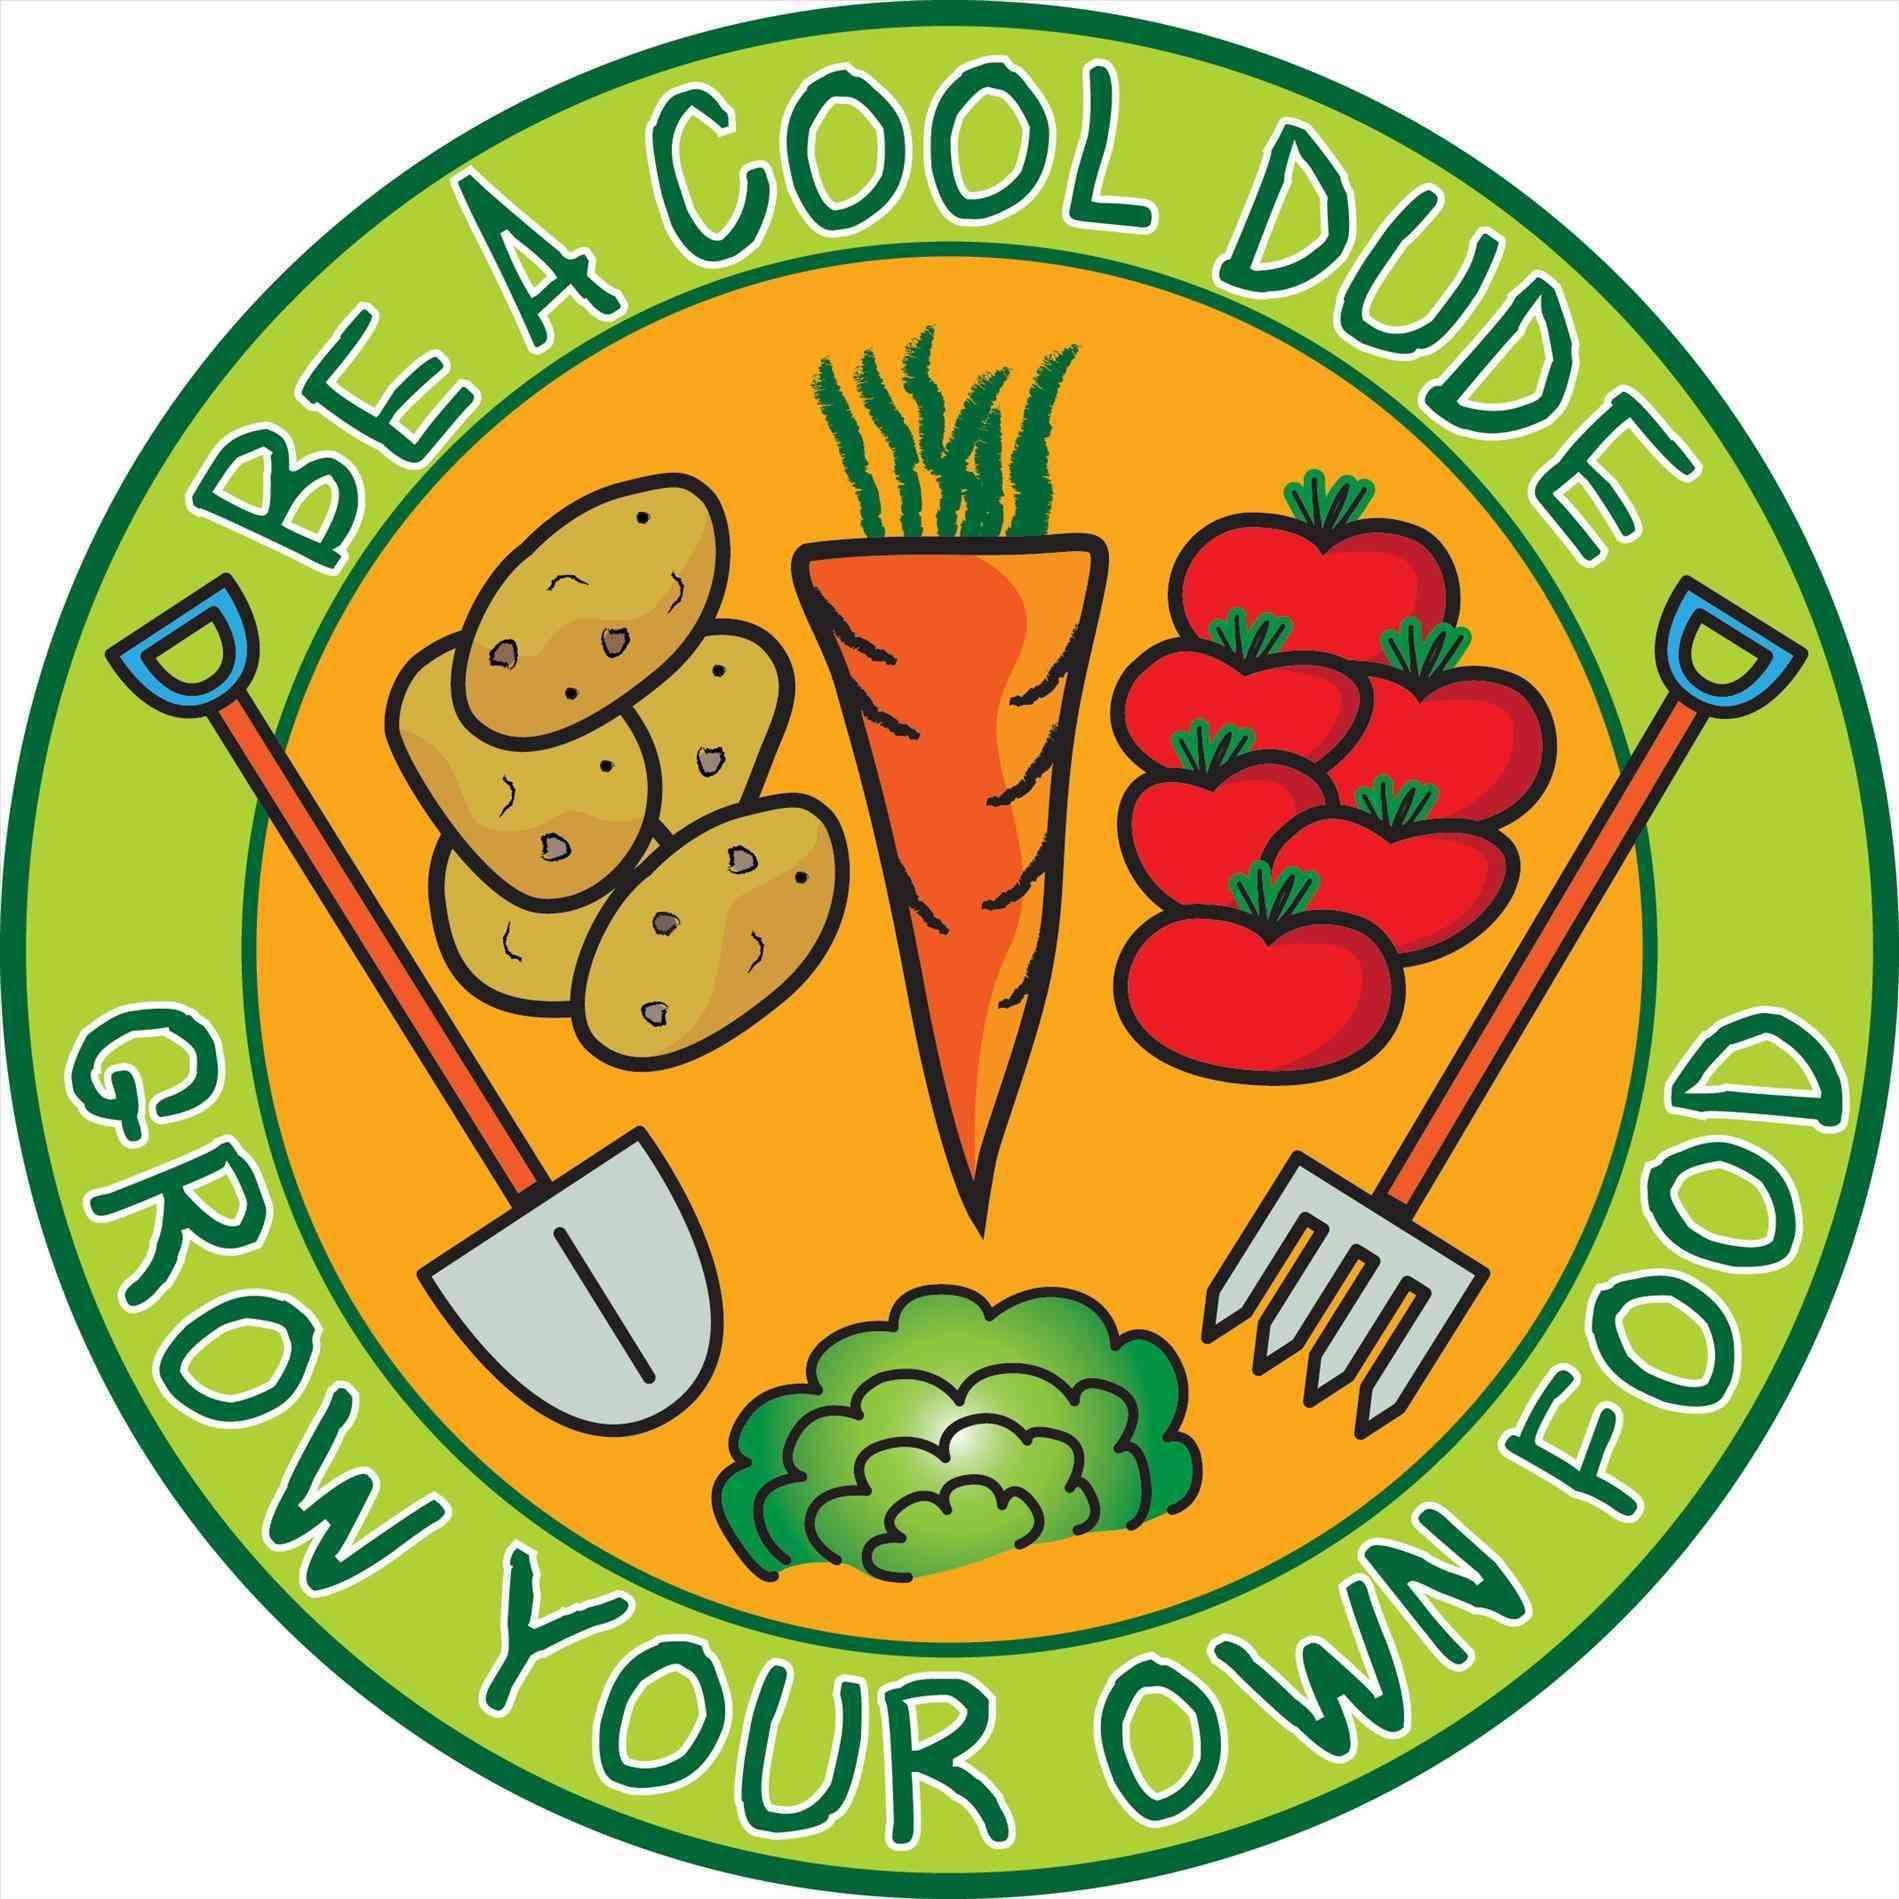 1899x1899 Free Food Garden Clipart Food Garden Cliparts Hanslodge Clip Art